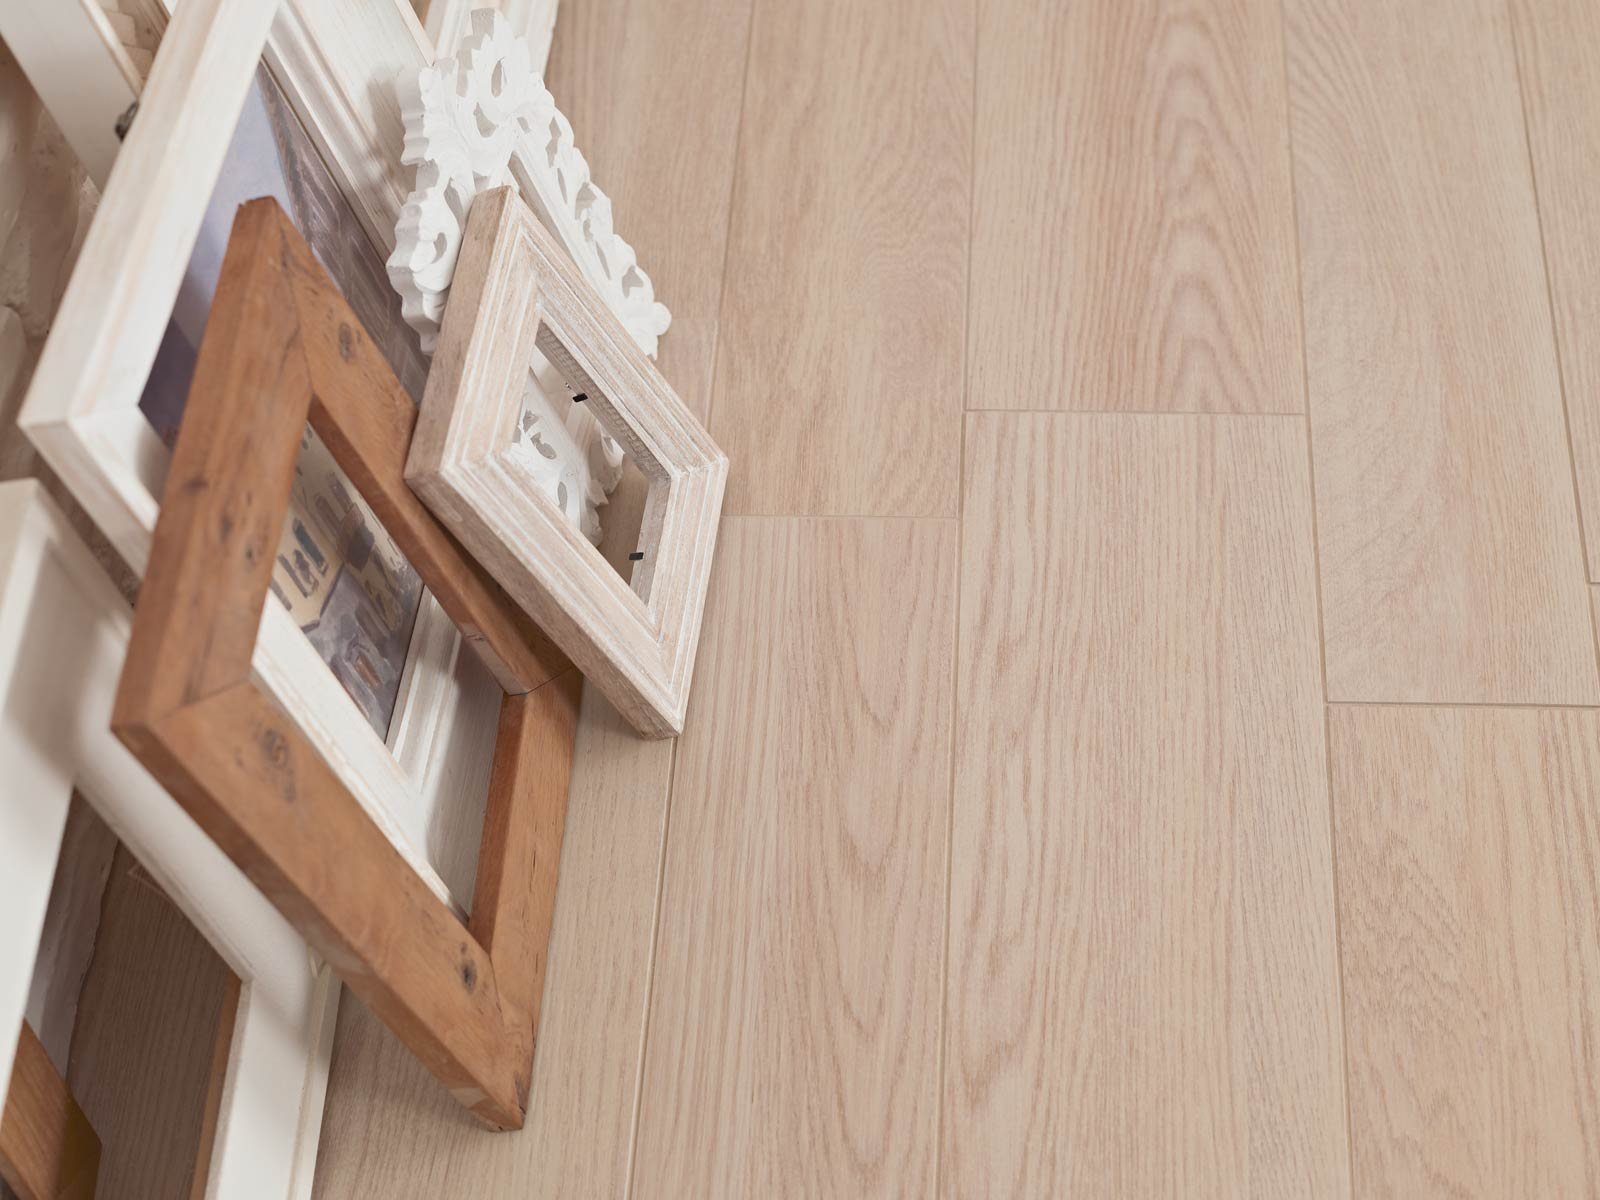 Treverk gres fine porcellanato effetto legno marazzi for Marazzi treverk teak